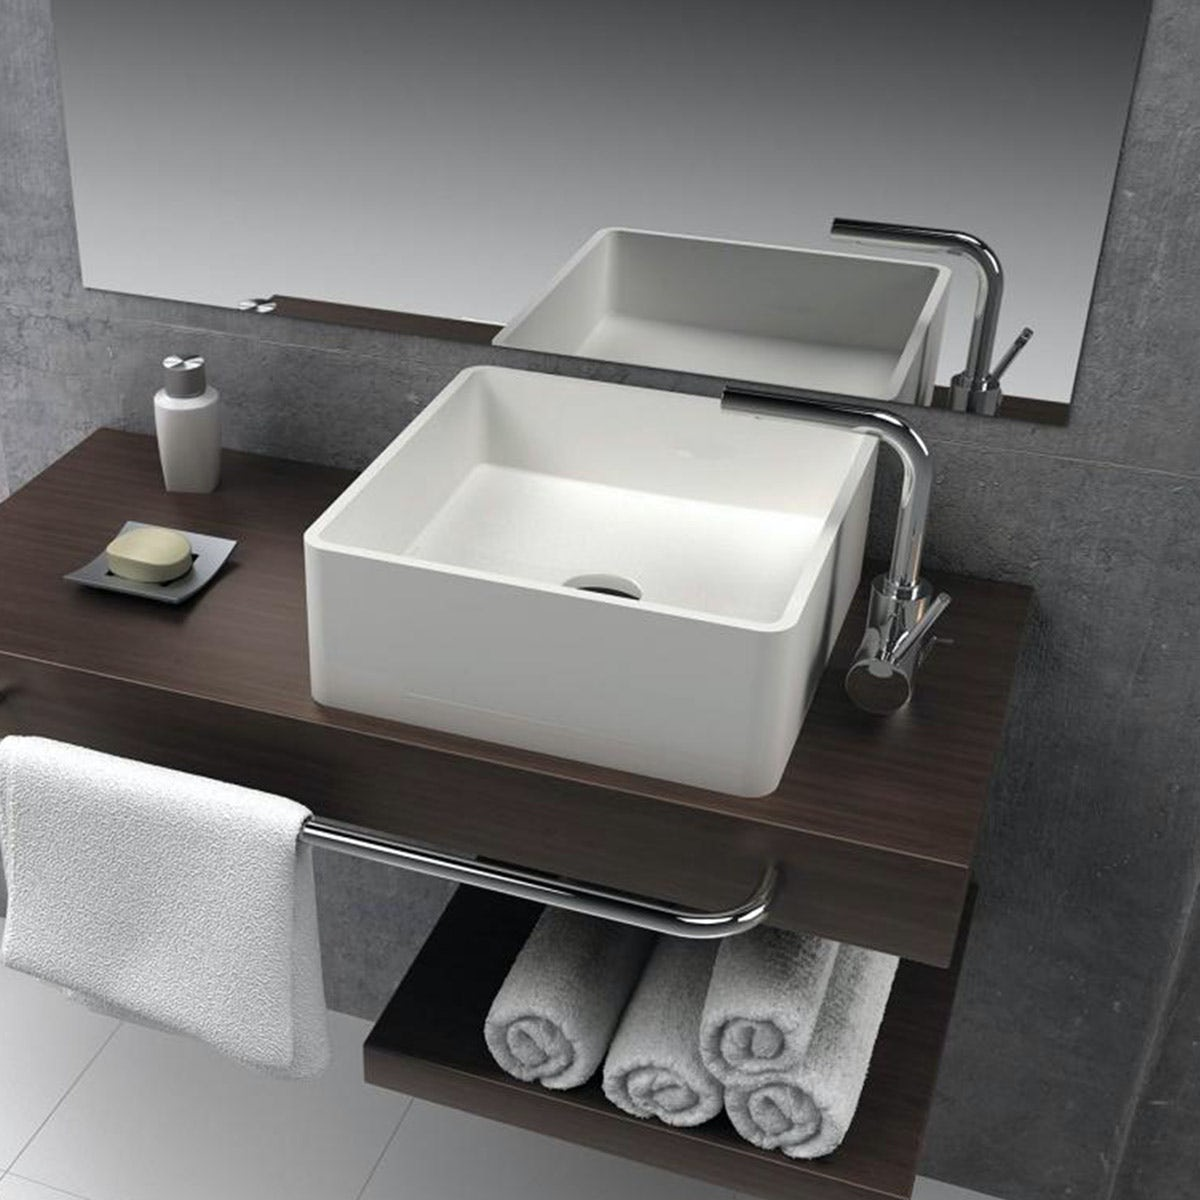 Belle de Louvain Carpi solid surface stone resin square counter top basin 400mm